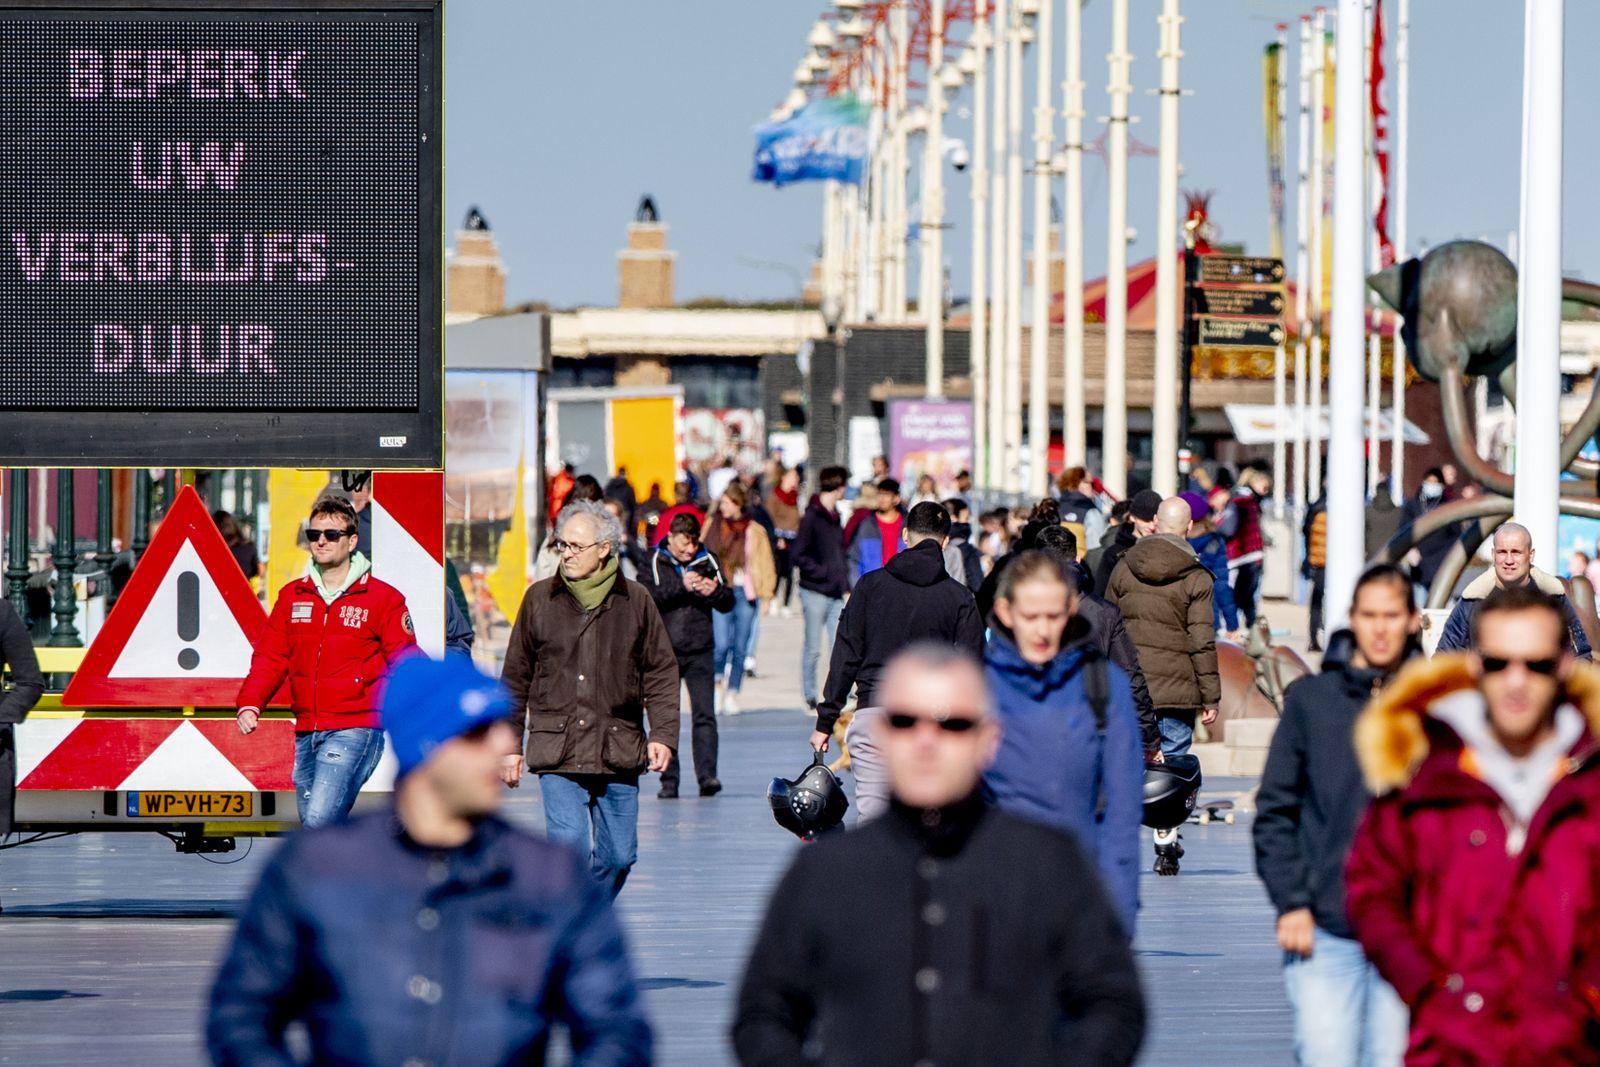 Crowded boulevard of Scheveningen in The Hague, Netherlands - 22 Mar 2020